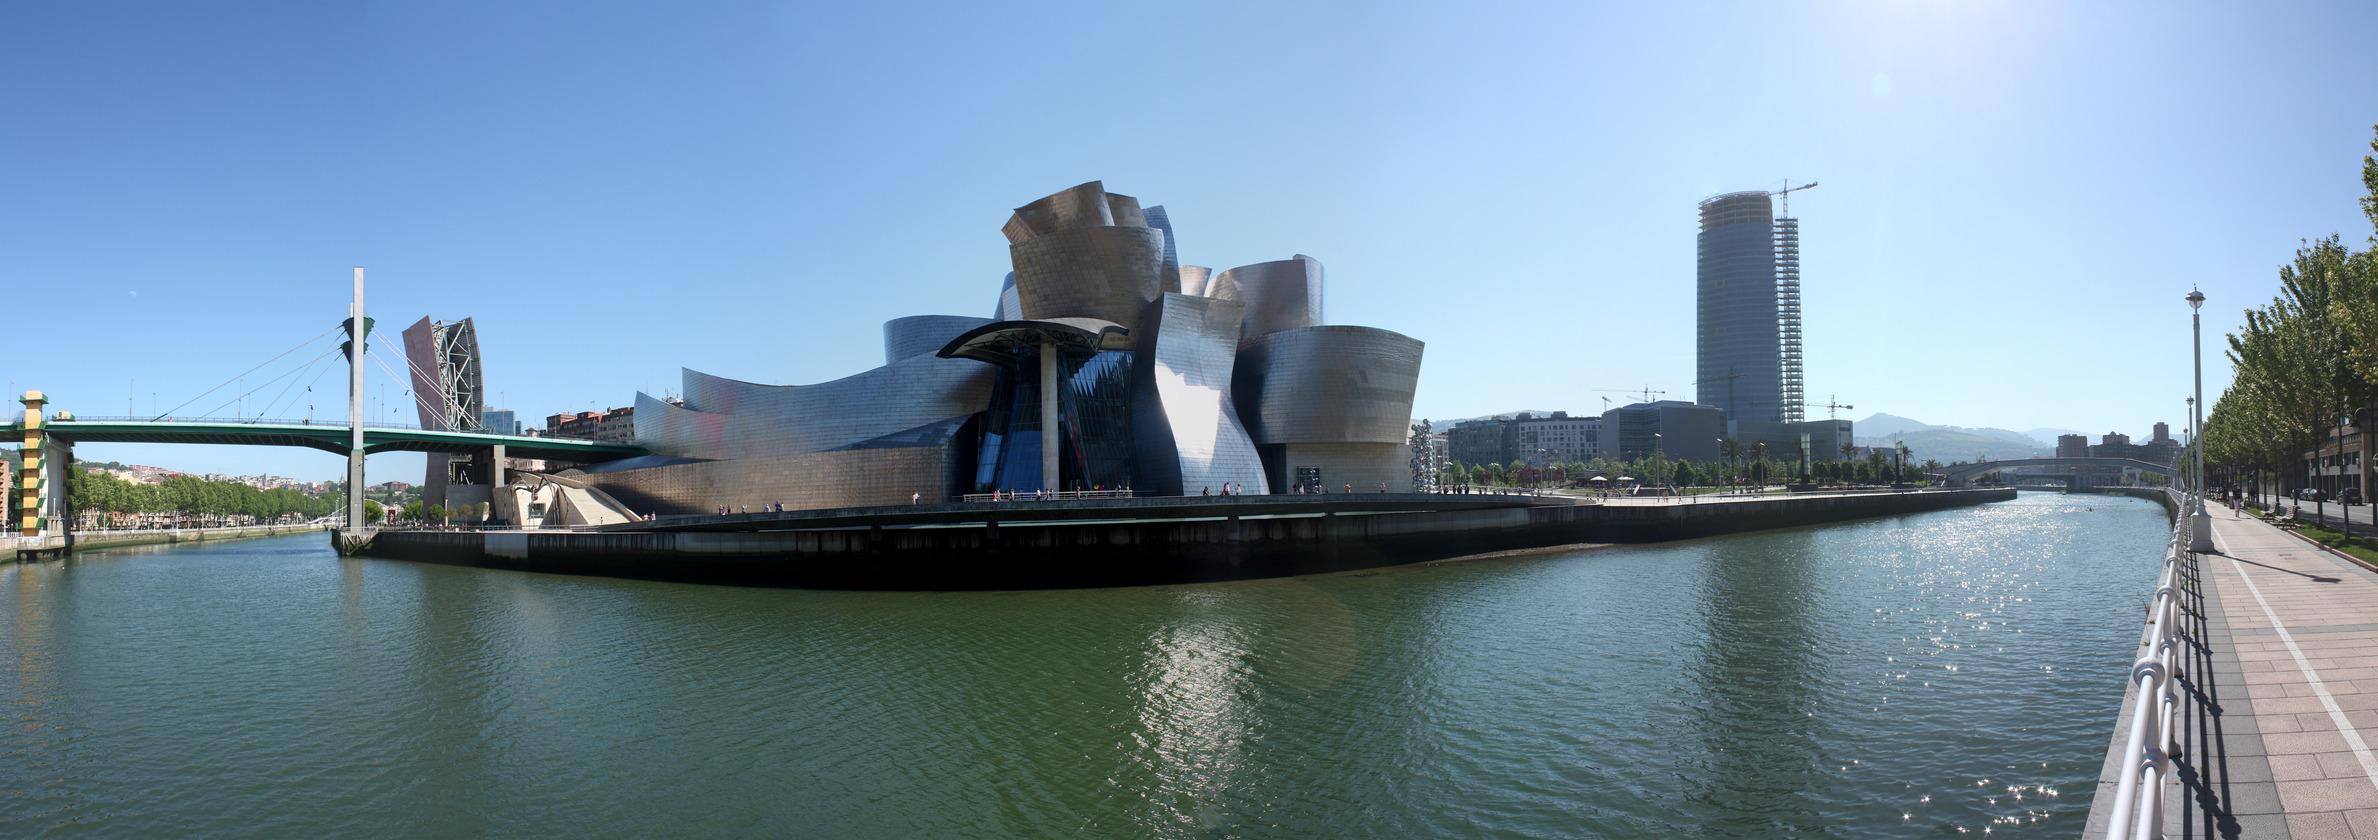 Comunica 720 empresa de comunicación online en Bilbao, Vizcaya